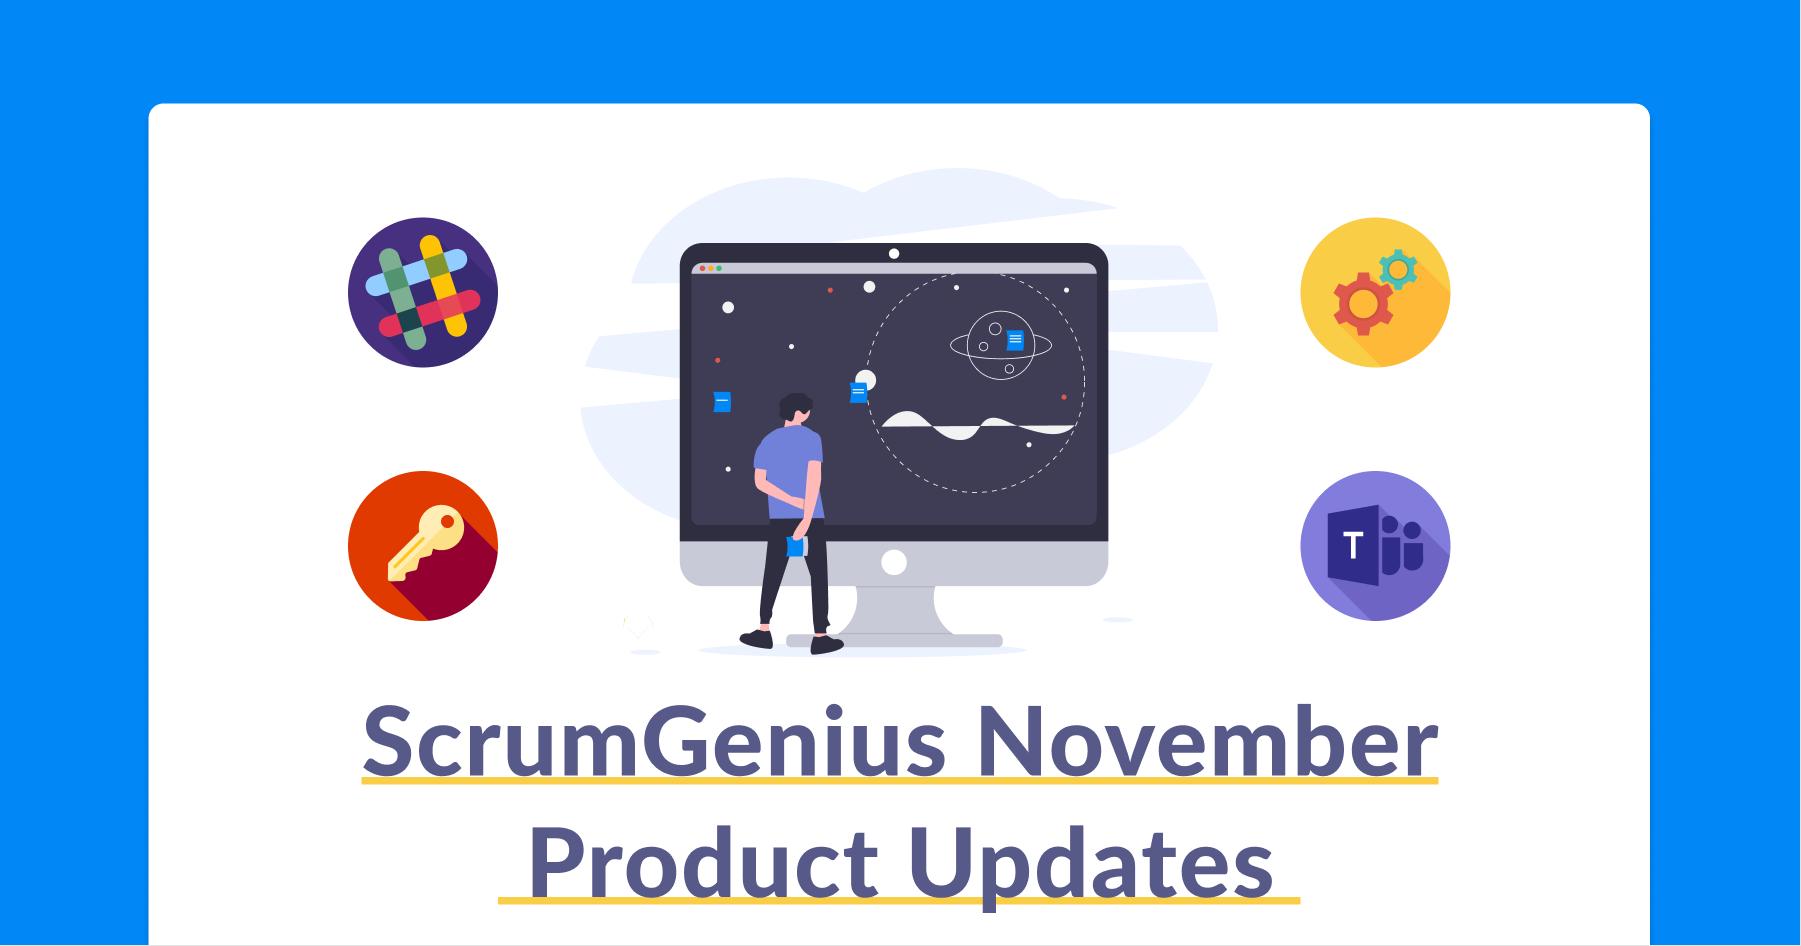 ScrumGenius November Product Updates